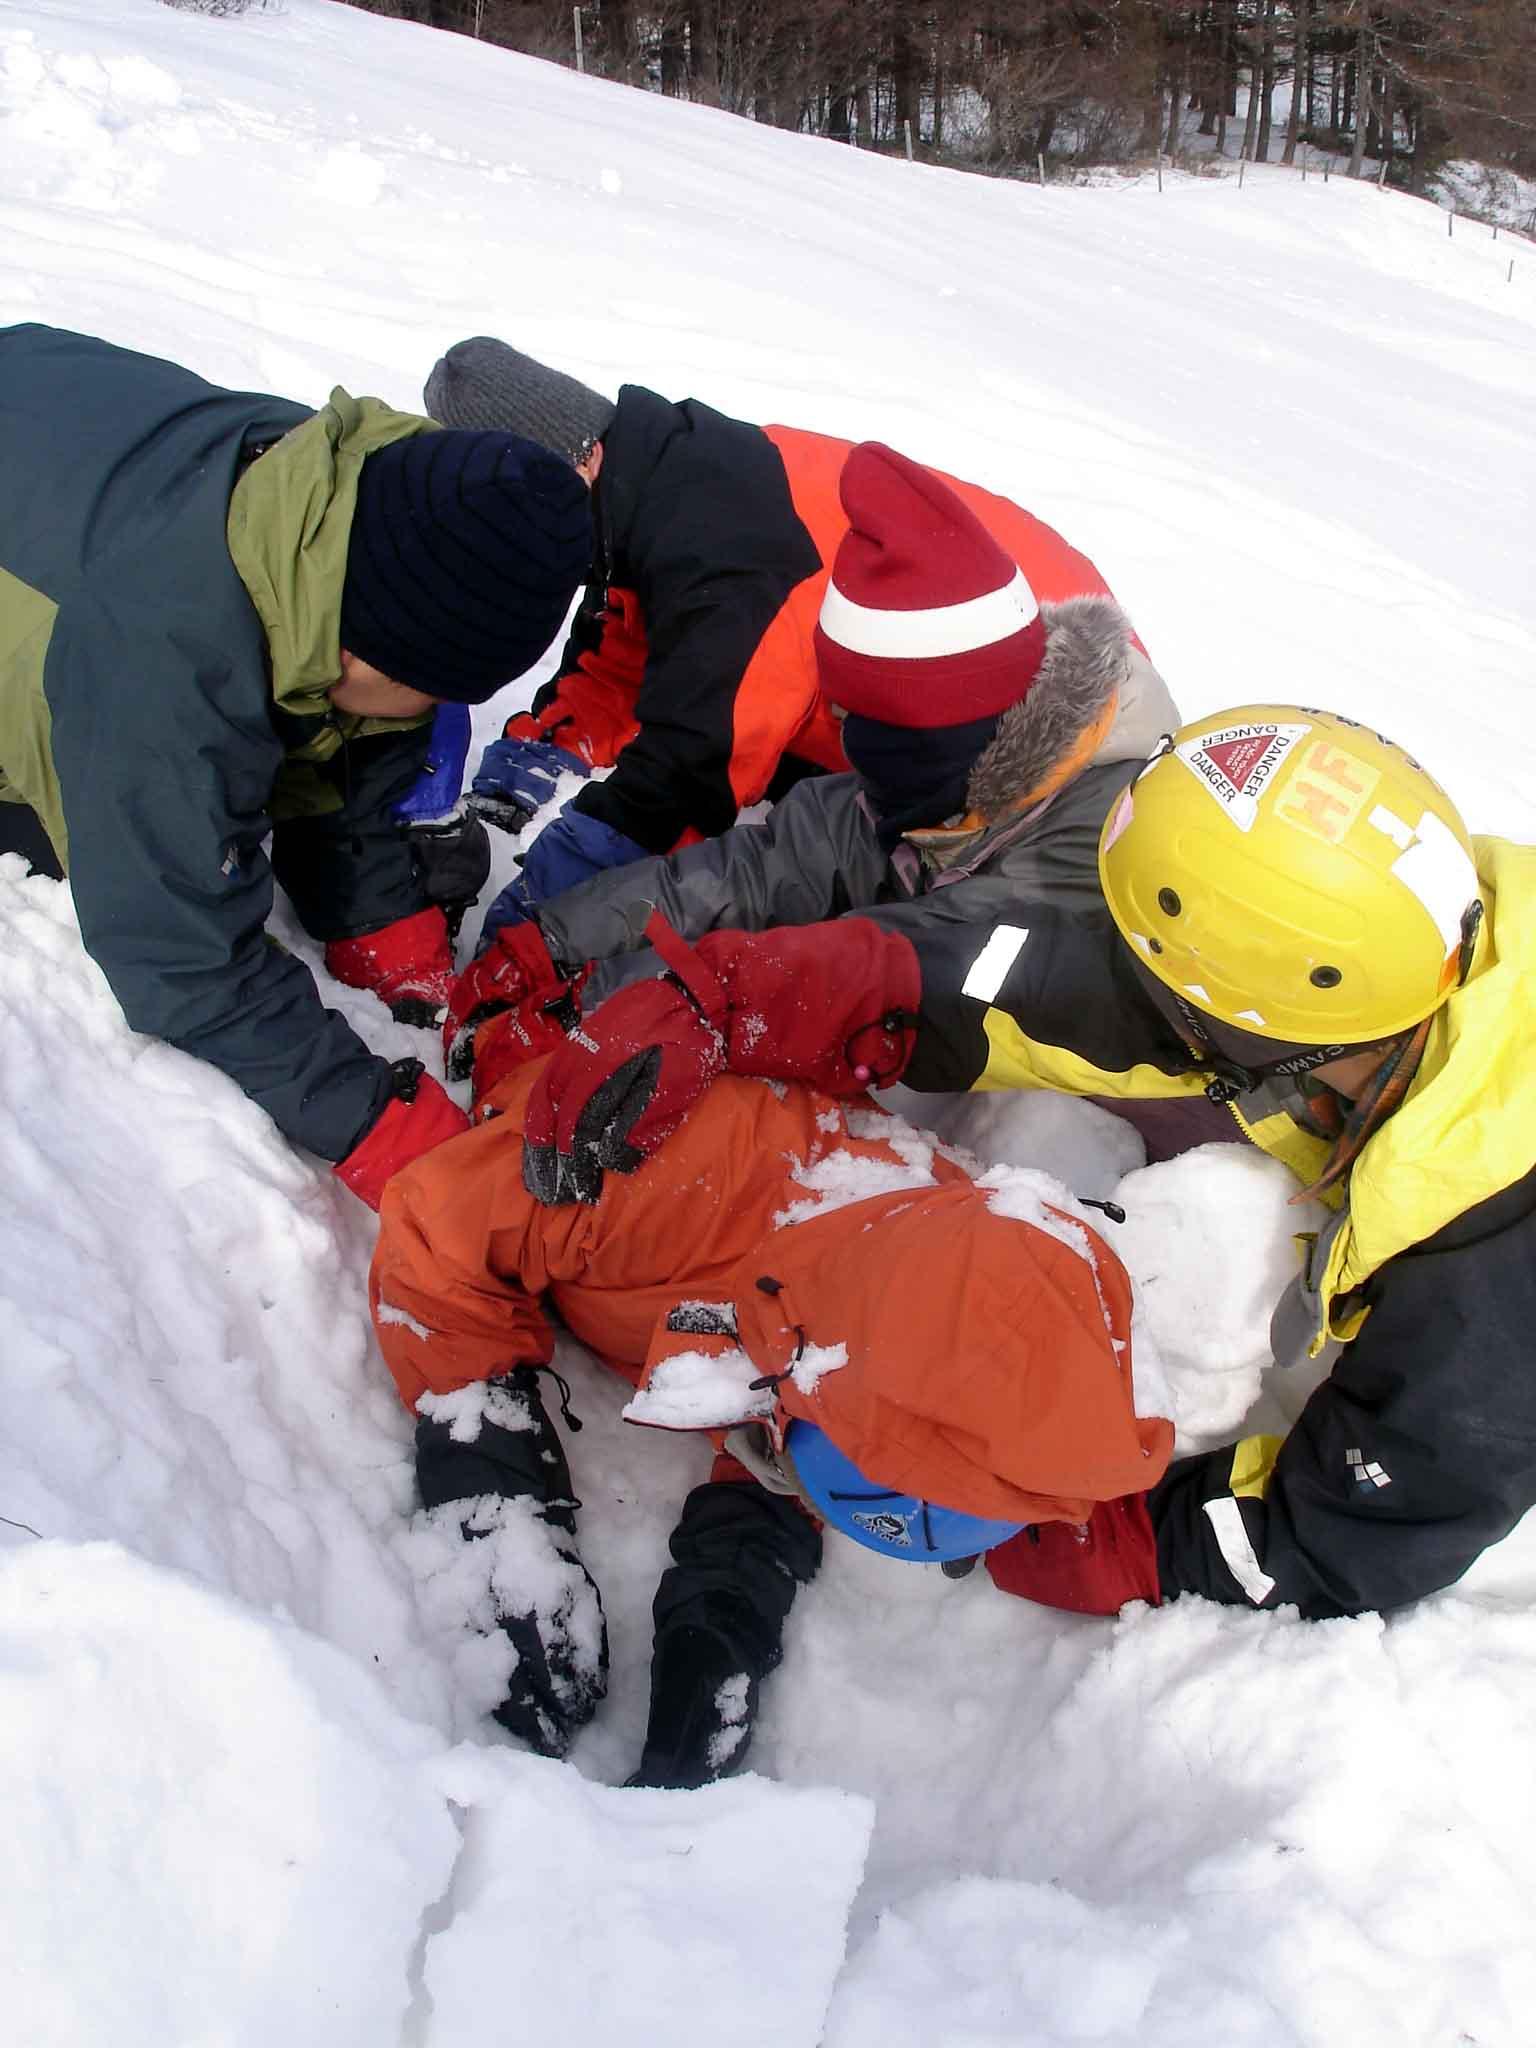 2008.1.14 ★雪中埋没体験と救出訓練